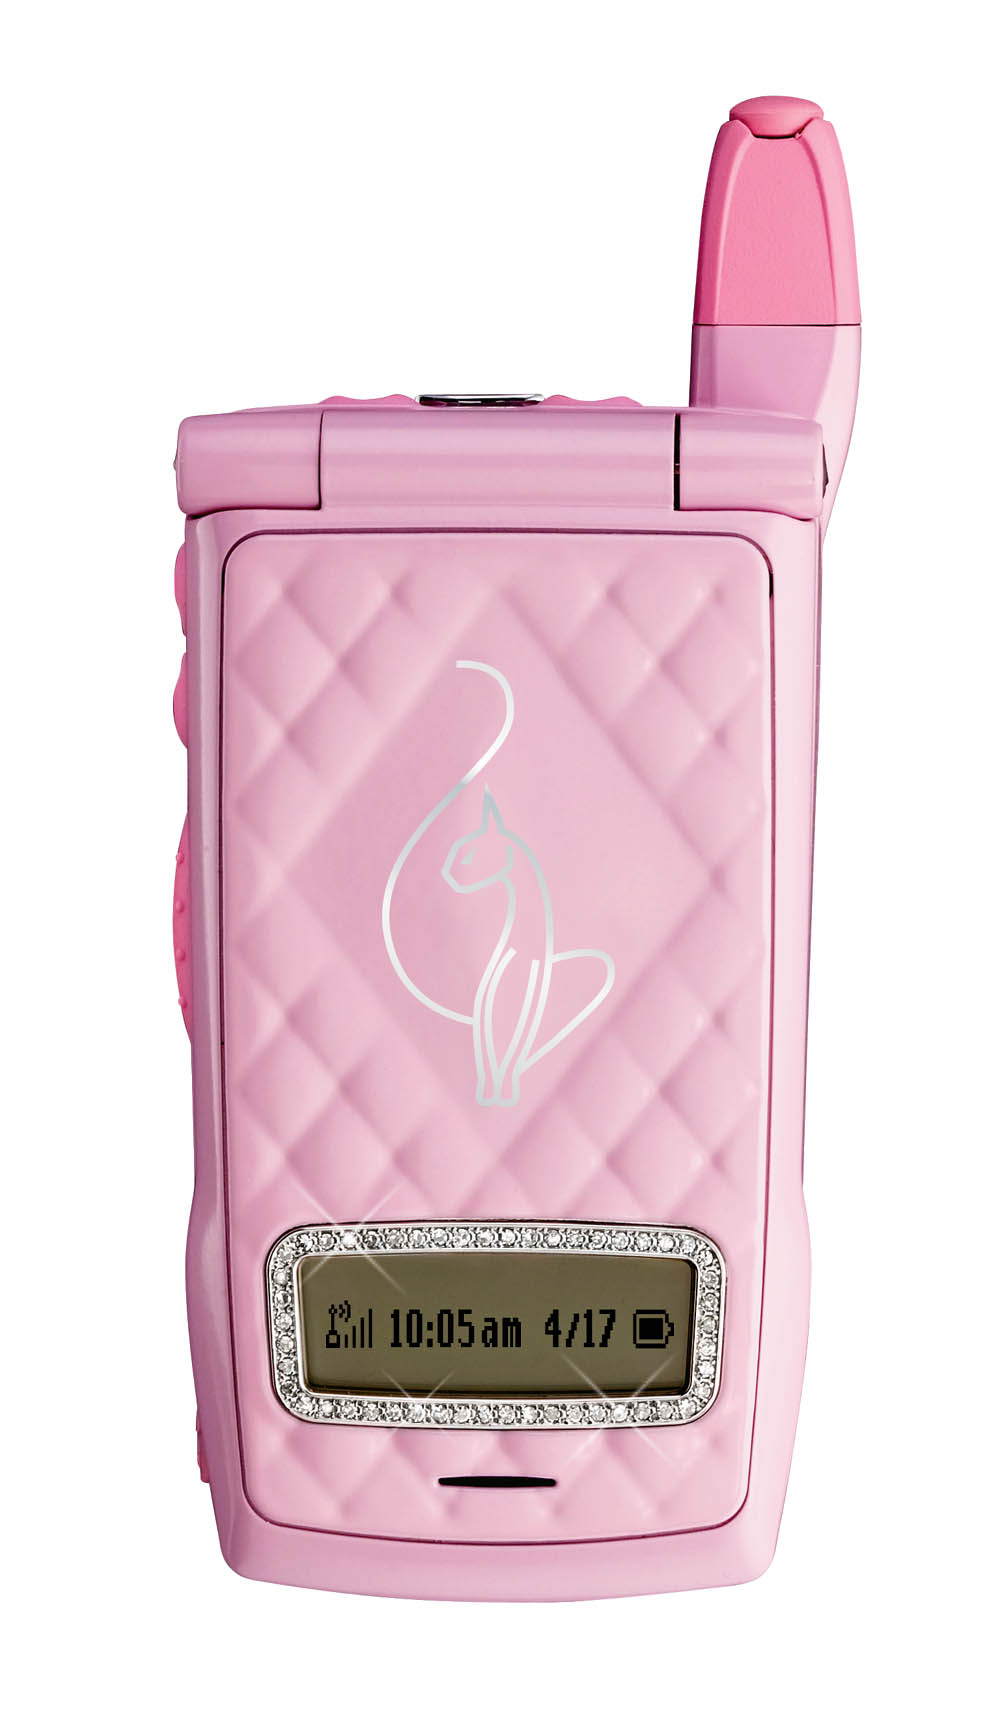 Baby Phat I833 Announced Mobiletracker